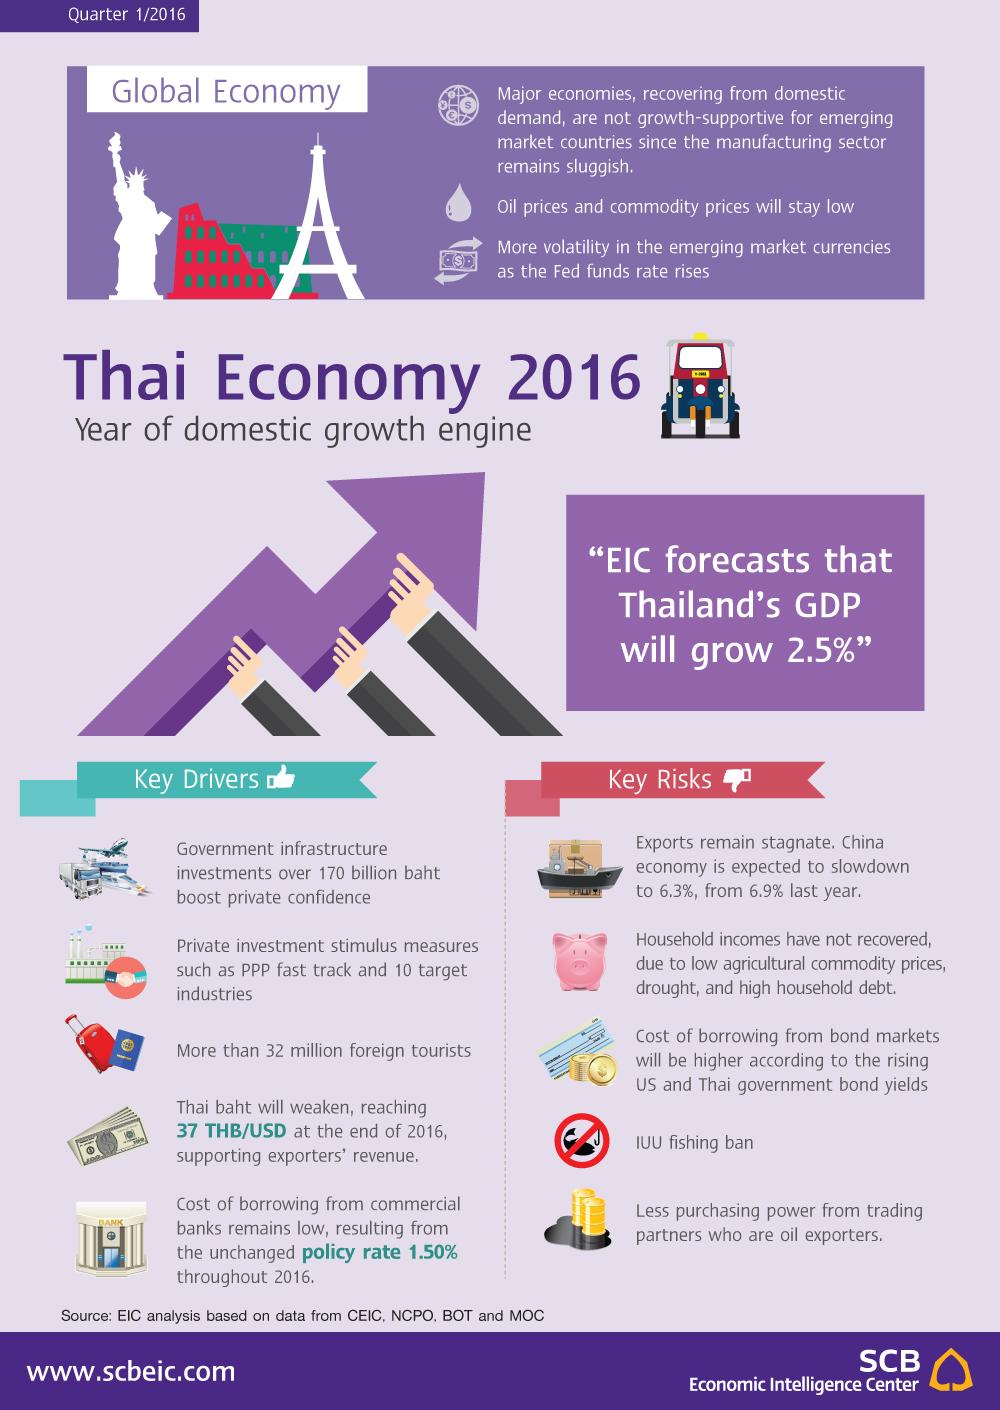 thailand economic analysis Country partnership strategy: thailand, 2013-2016 economic analysis (summary): asian development outlook (thailand)1 a economic performance.